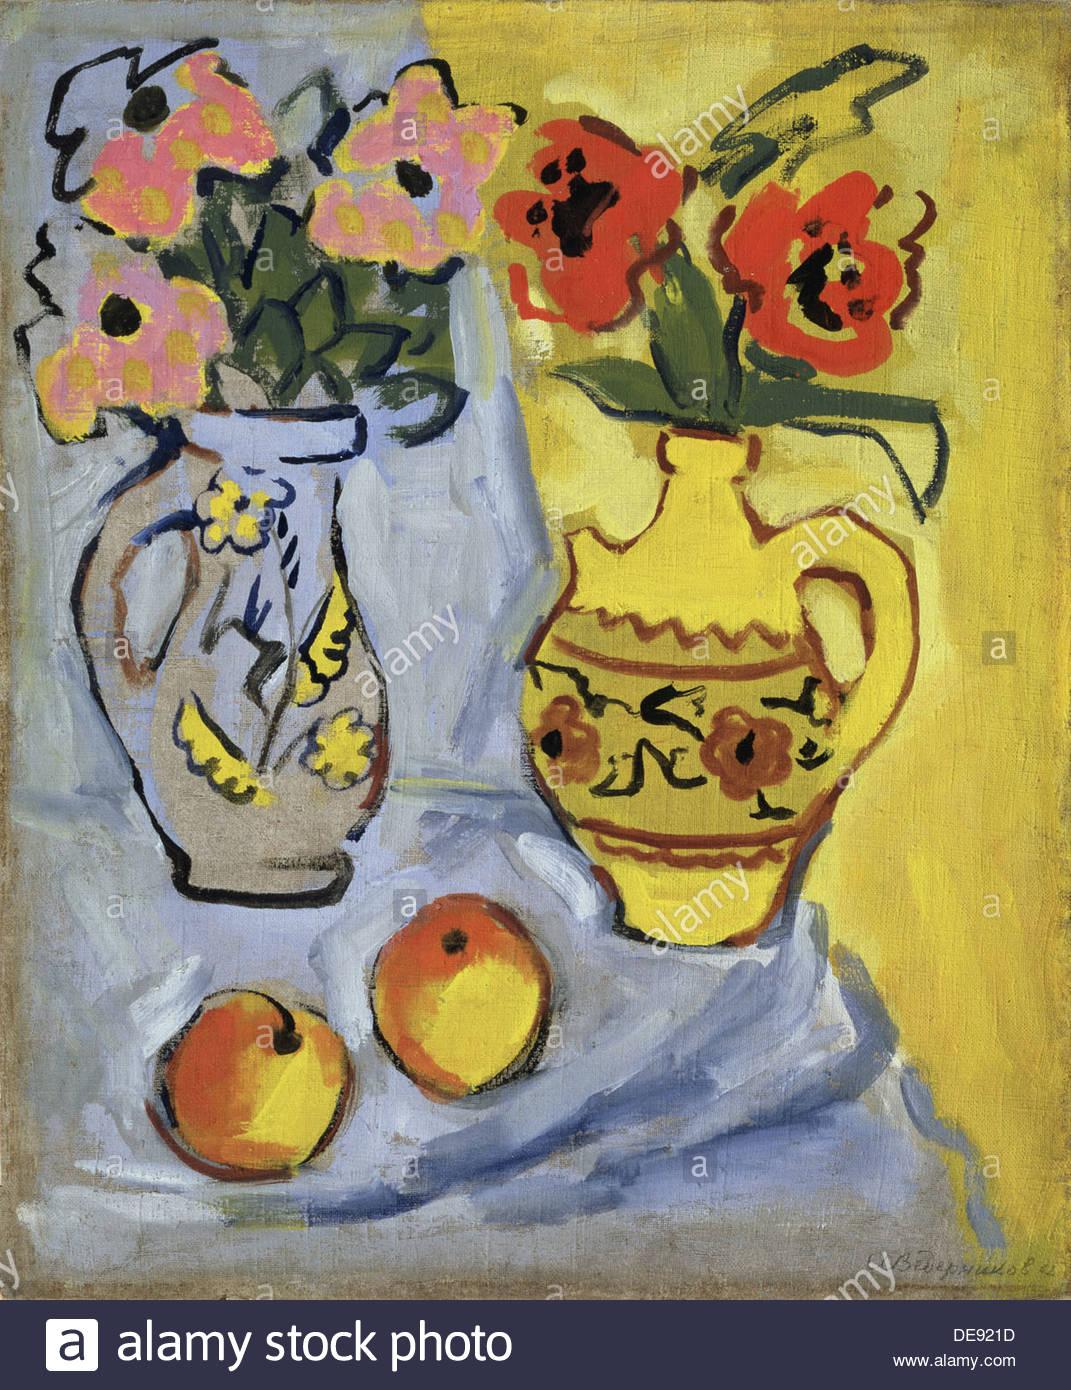 La vie, toujours jaune 1962. Artiste: Alexander Vedernikov, Semionovitch (1898-1975) Photo Stock